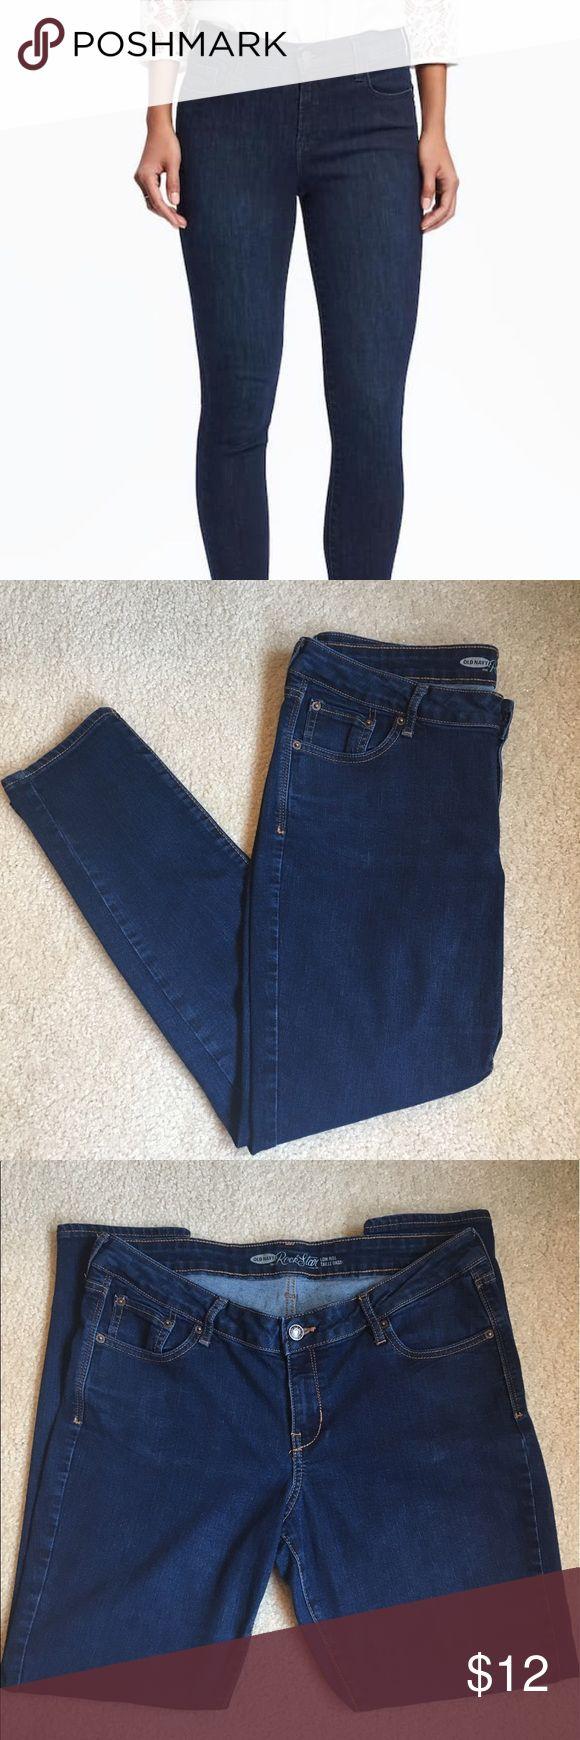 Old Navy Rockstar jeans size 14 EUC rockstar jeans from old navy. Dark wash size 14. Inseam 32 Sits below the waist. Snug through hip and thigh. Narrow leg opening. 32 1/2 waist 43 1/2 hip Old Navy Jeans Straight Leg